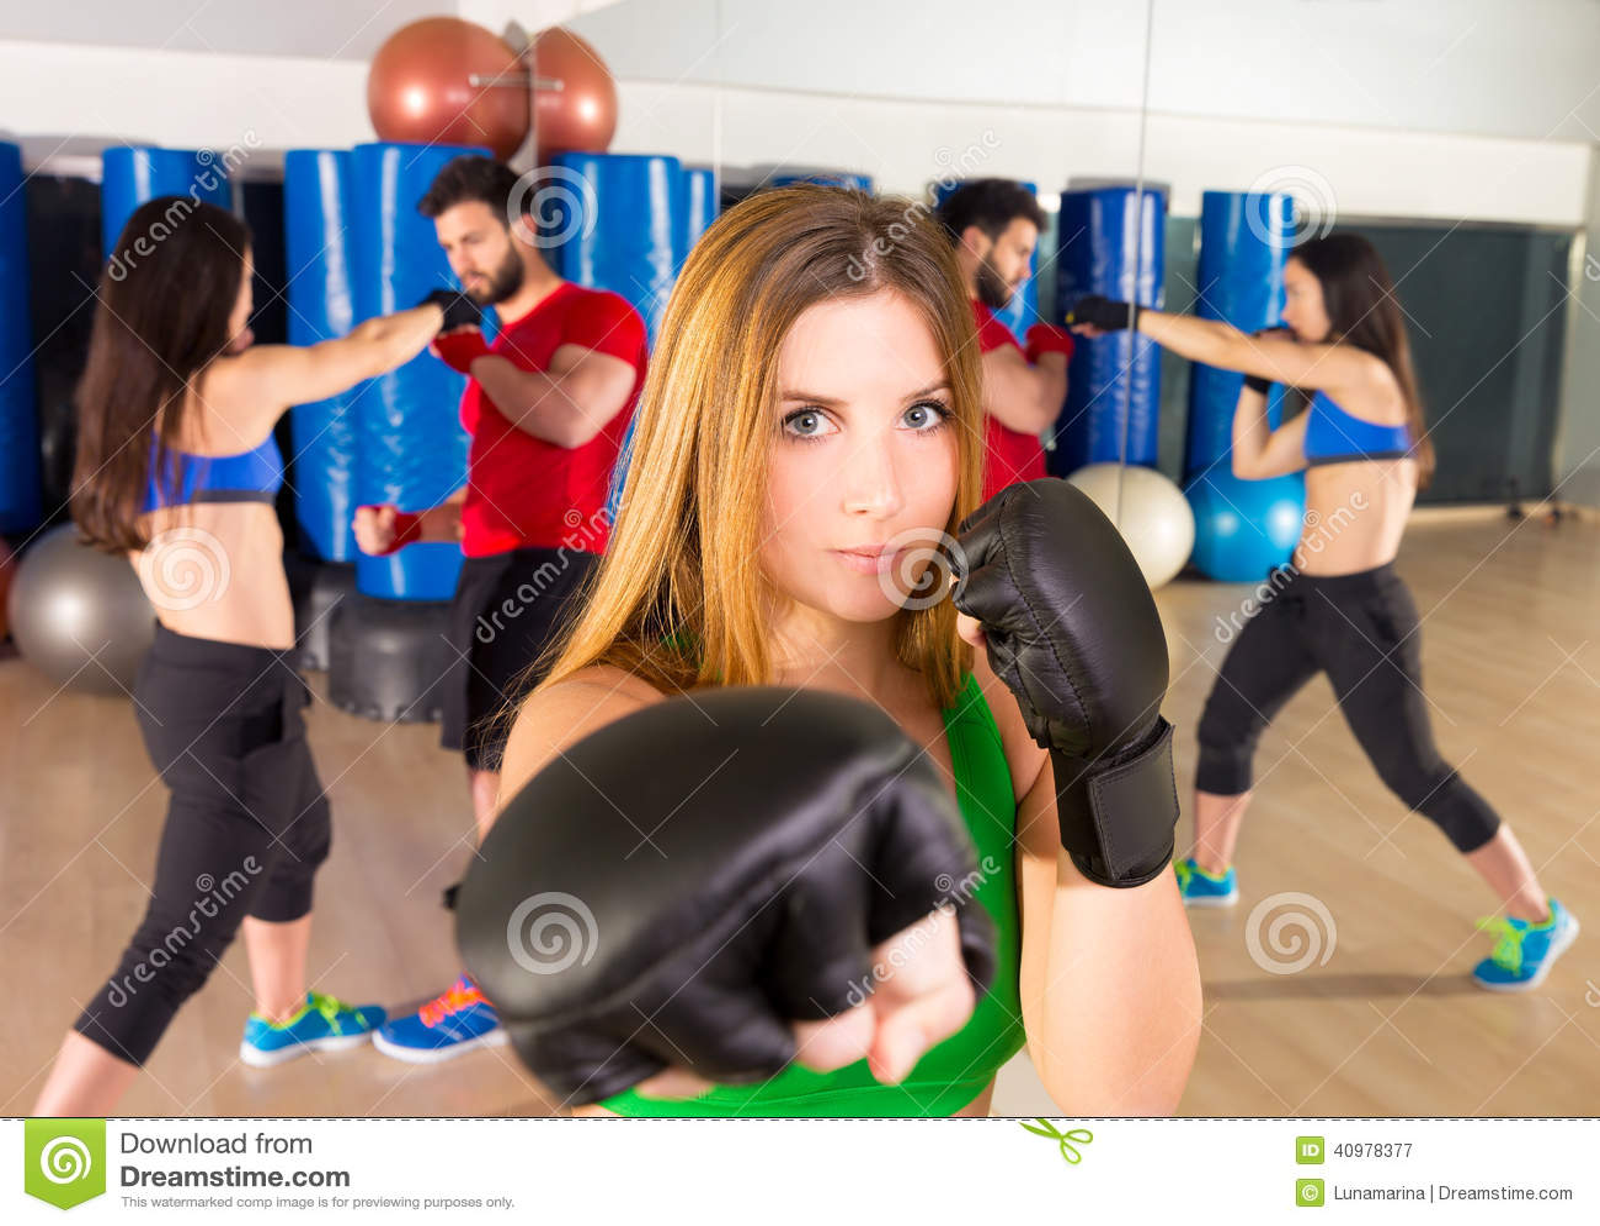 Boxing Aerobox Woman Portrait In Fitness Gym Stock Photo ...